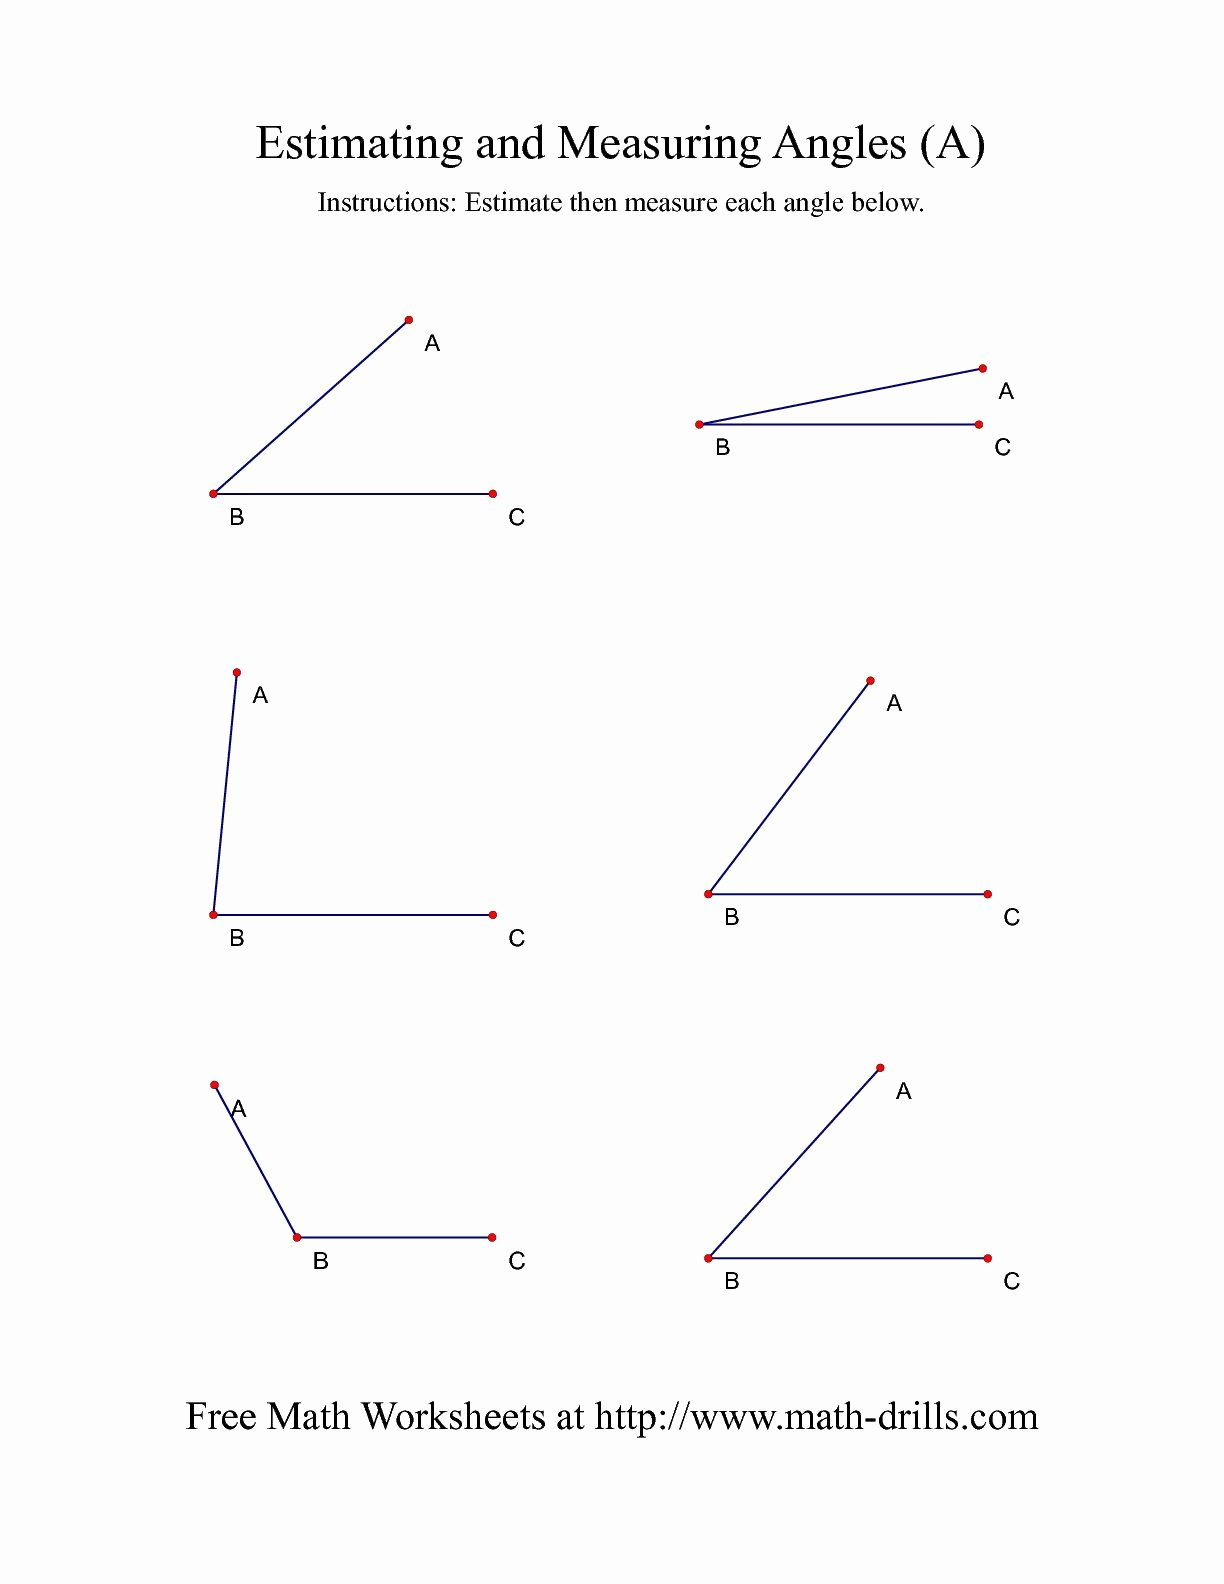 Measuring Angles Worksheet Pdf Inspirational Measuring Angles Worksheet Pdf the Best Worksheets Image